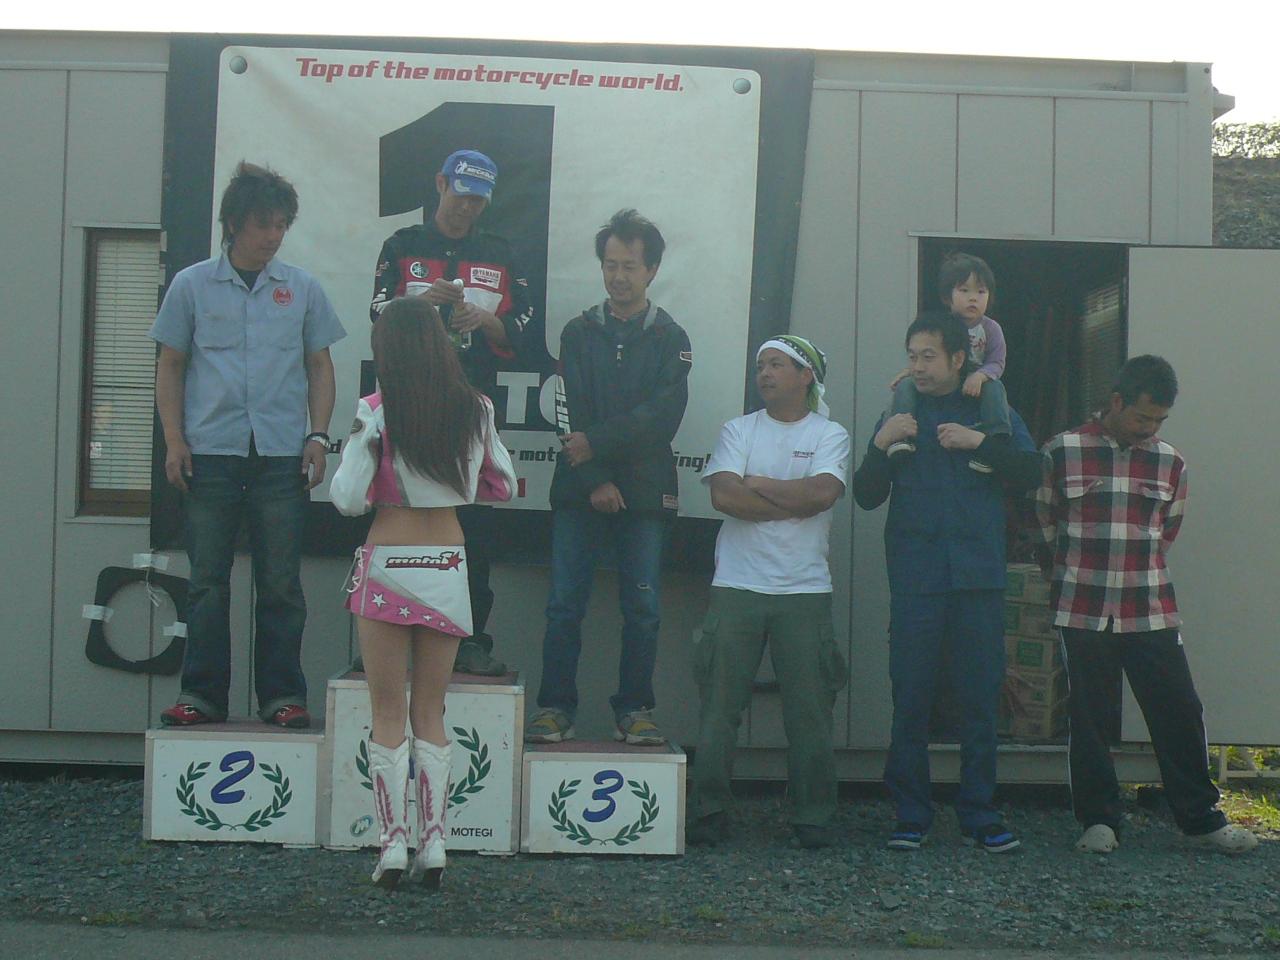 http://img.blogs.yahoo.co.jp/ybi/1/13/f5/tetsutaro499/folder/420377/img_420377_47575613_6?1240324400